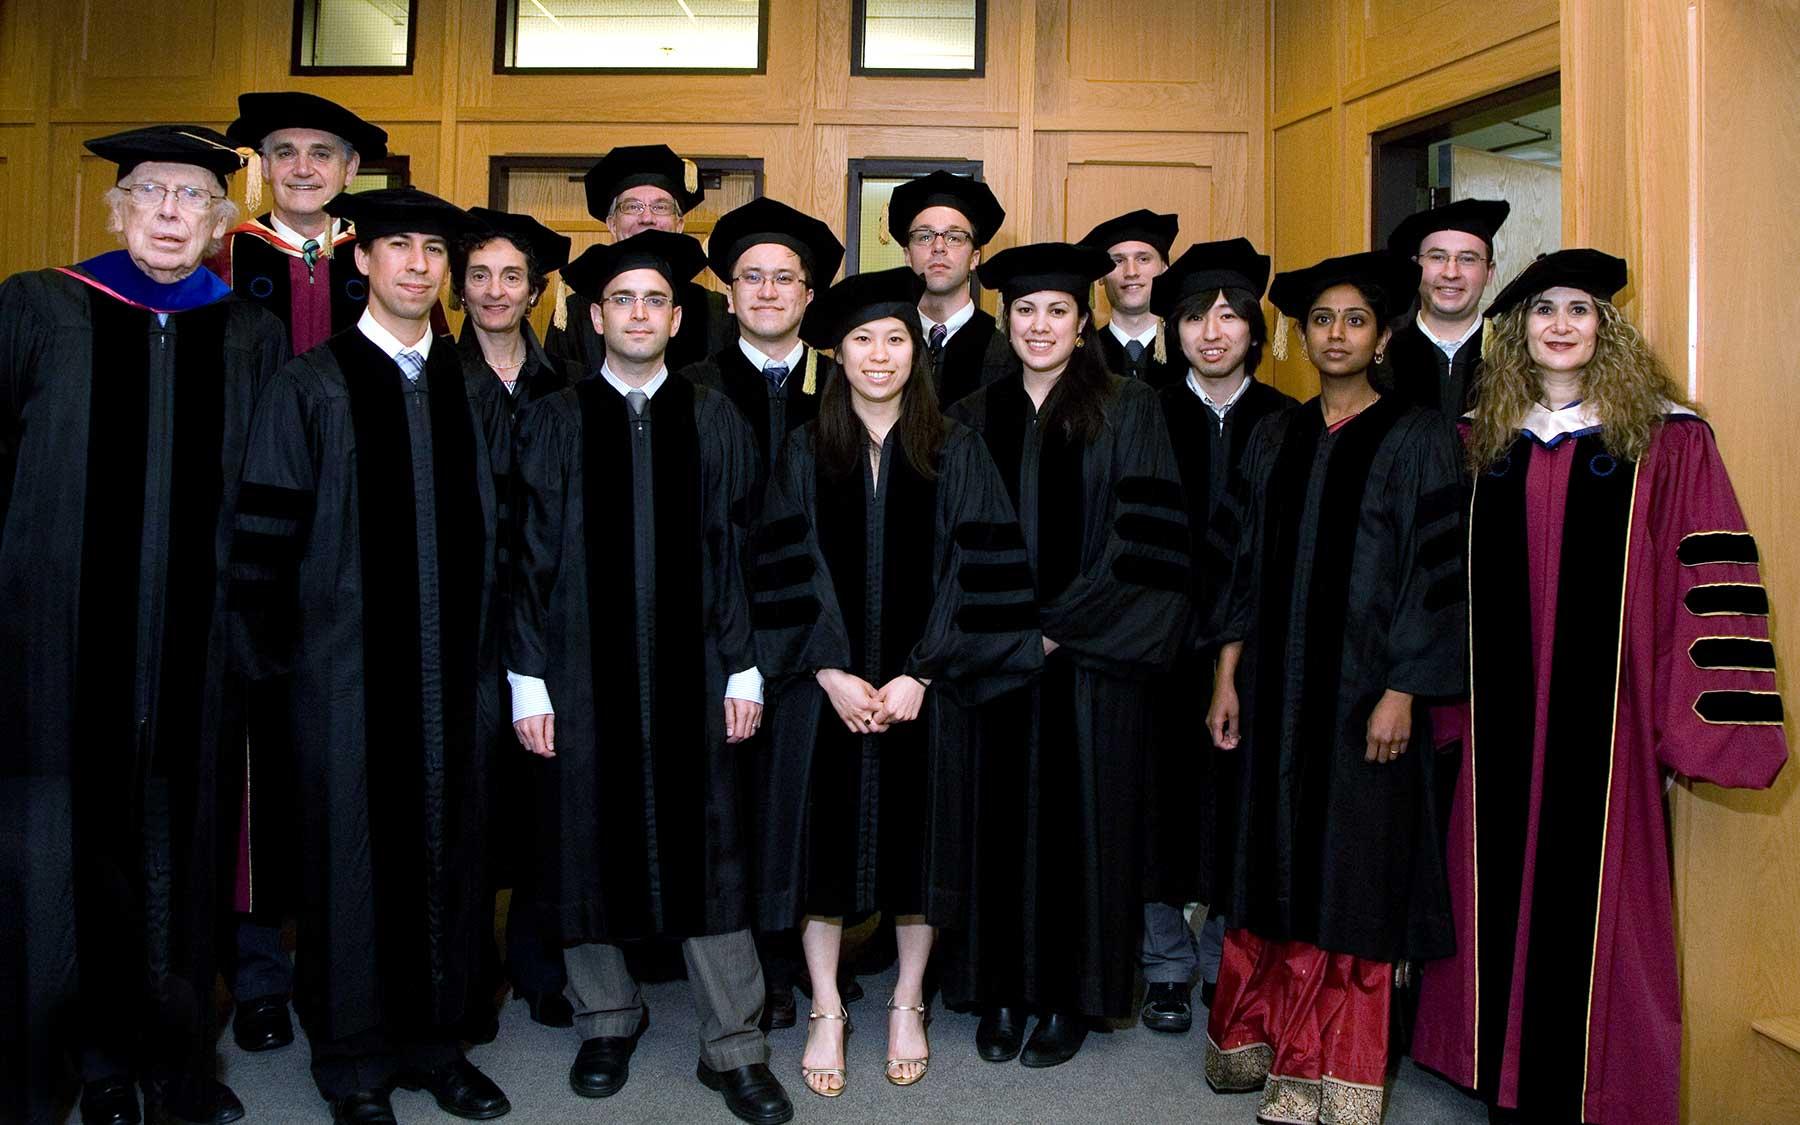 WSBS 2010 graduation